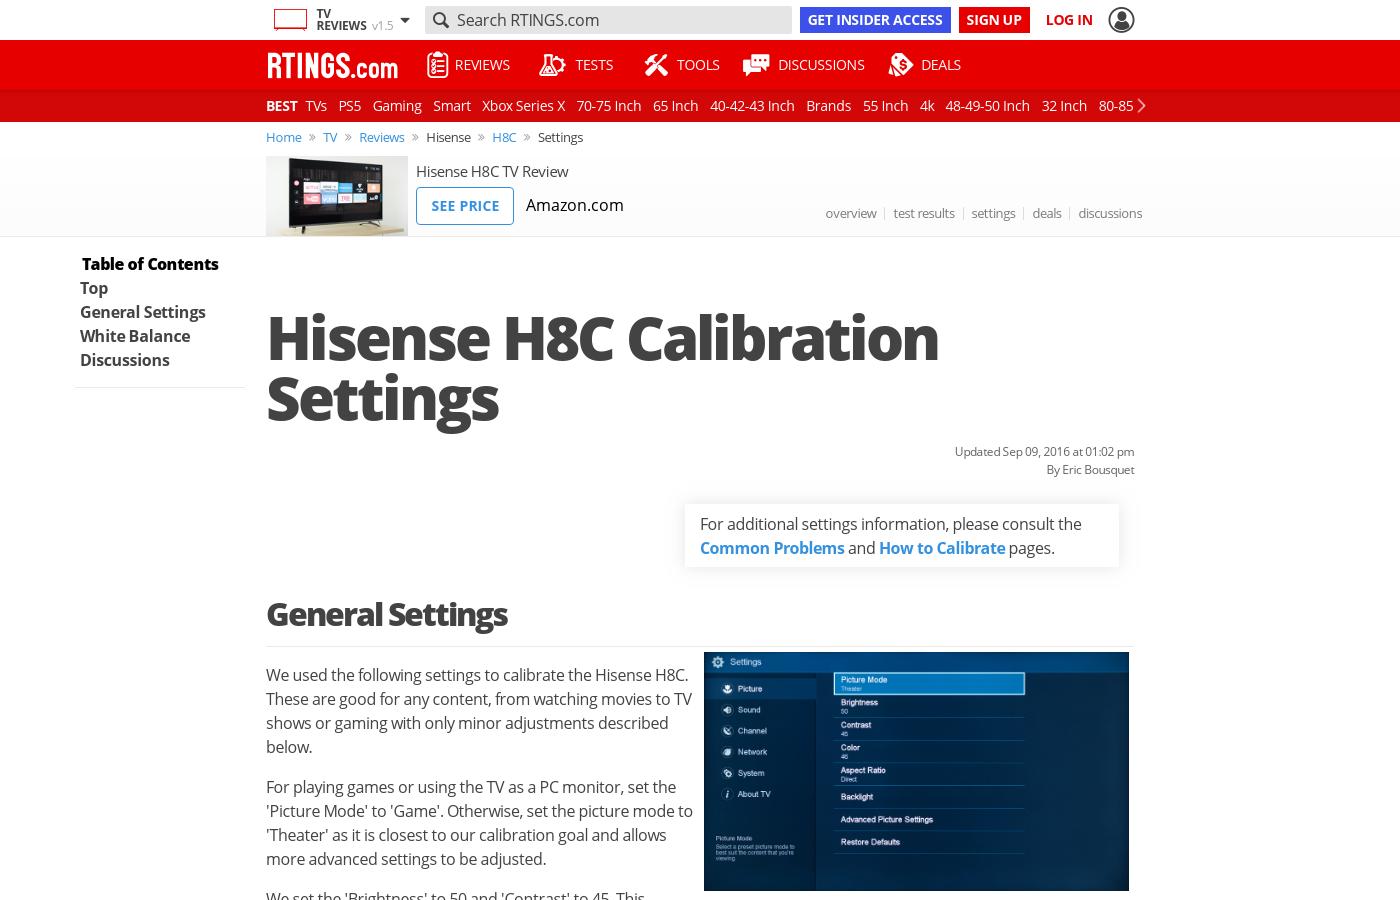 Hisense H8C Calibration Settings - RTINGS com